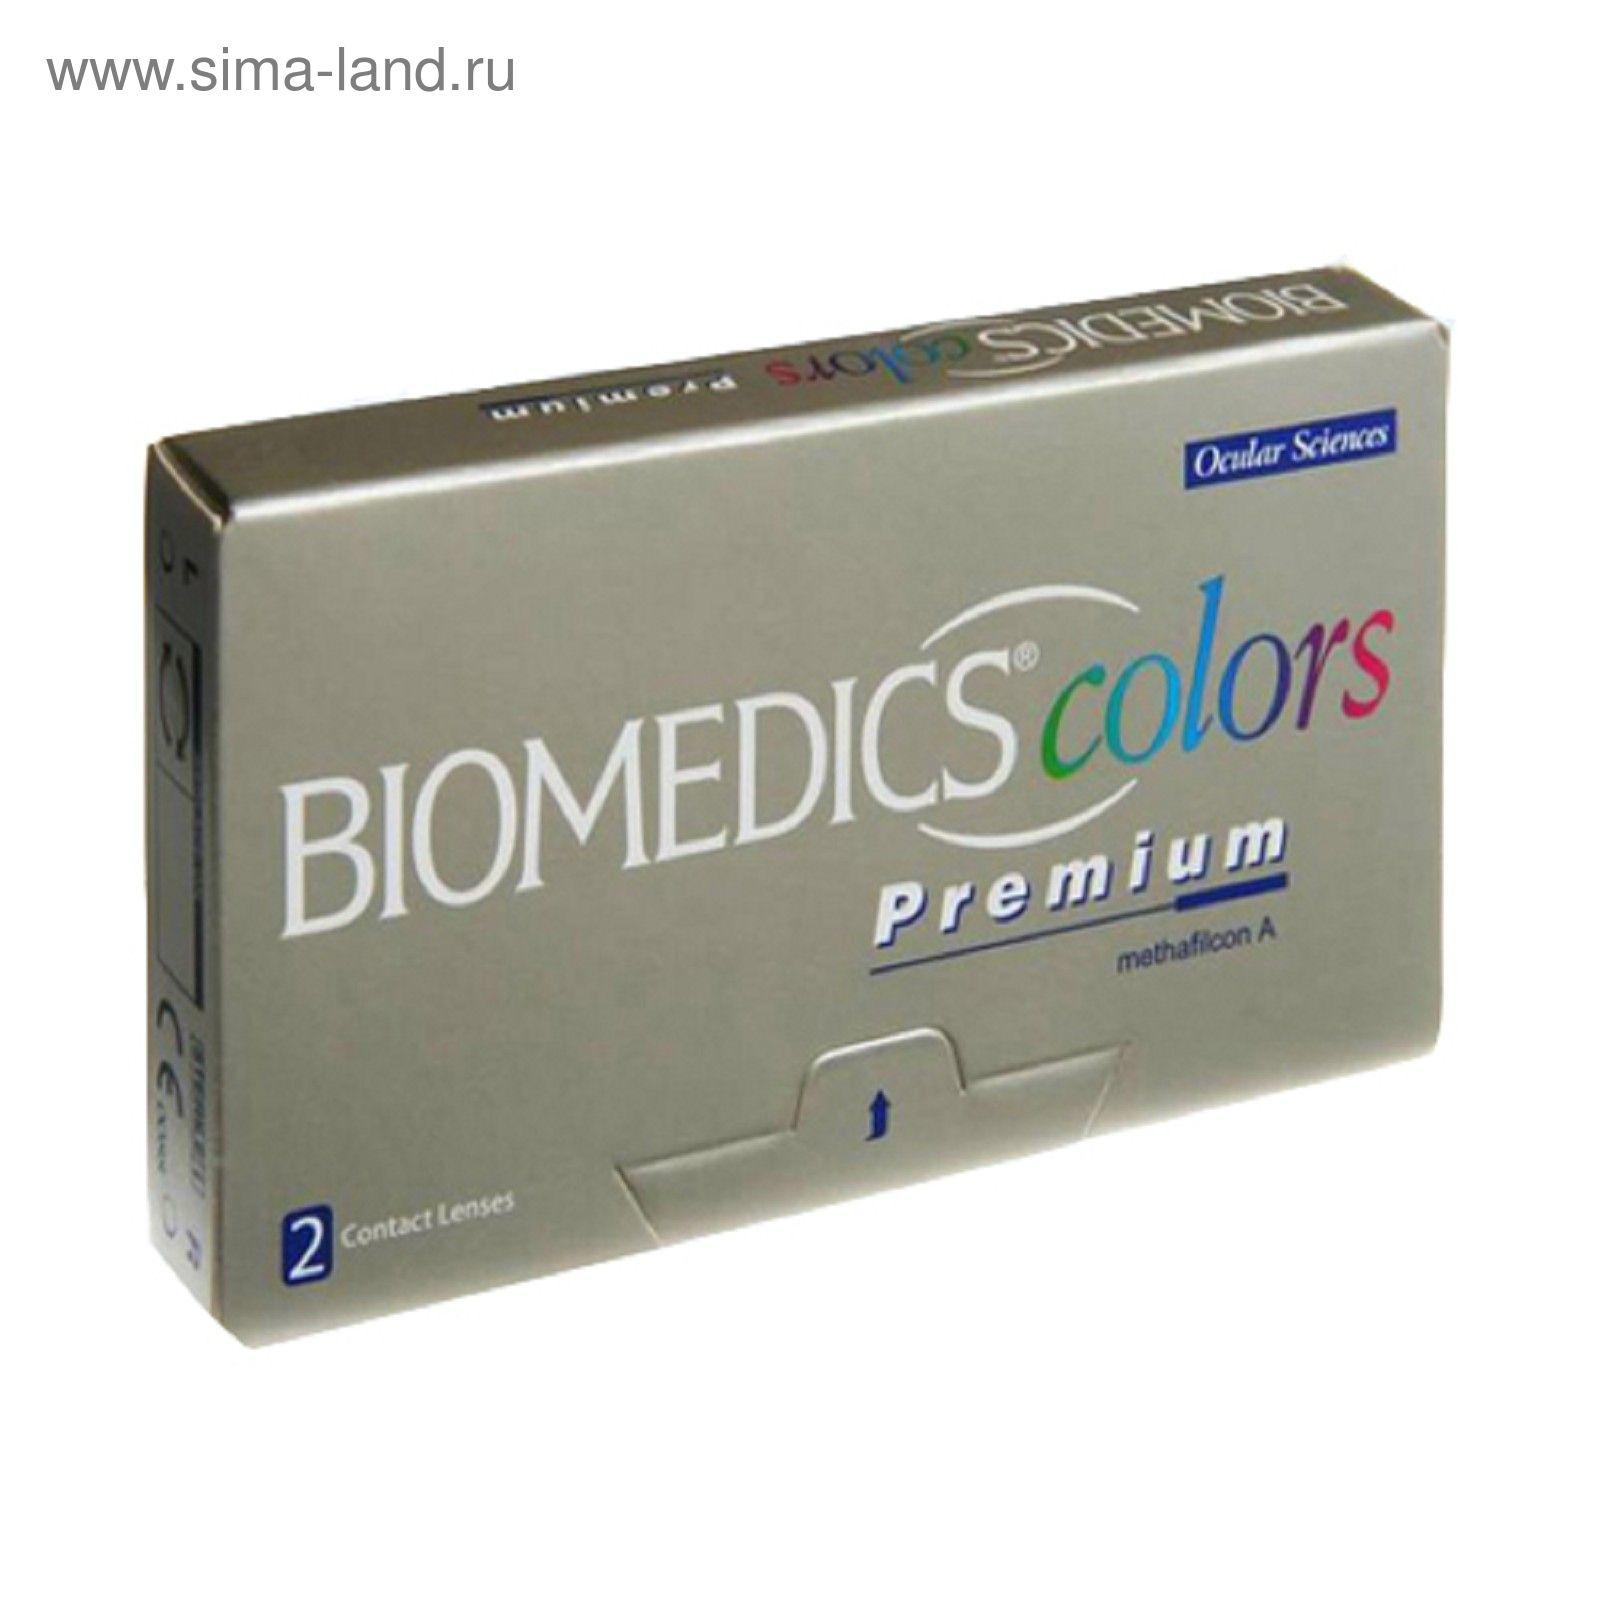 5b73d0073816 Цветные контактные линзы Biomedics Colors Premium - Aqua, -6.0/8,7 ...